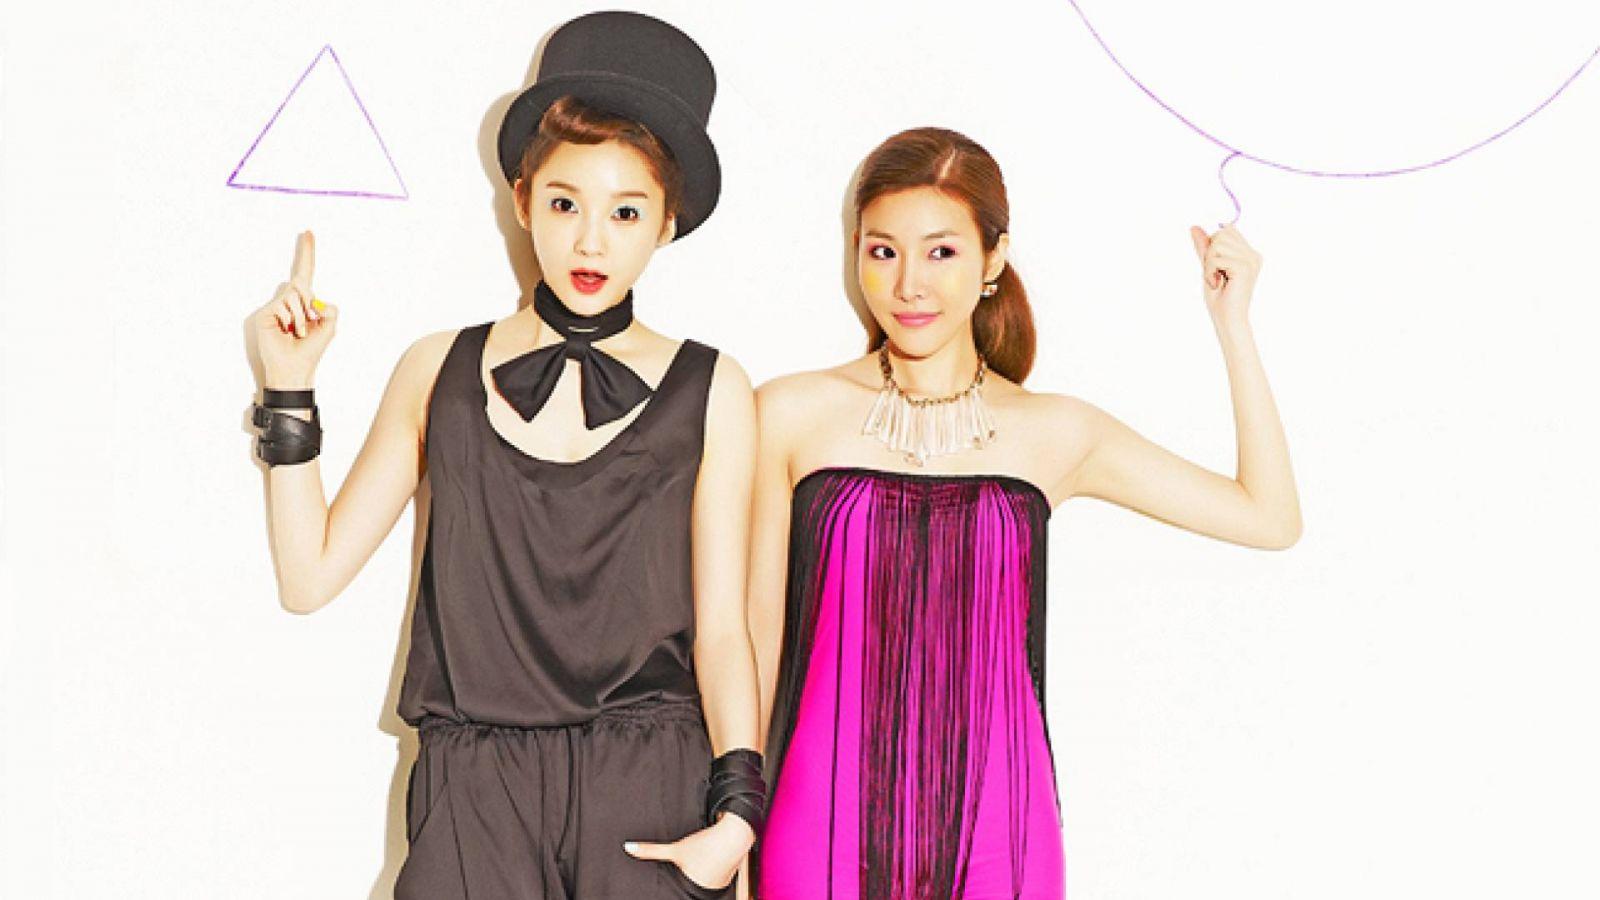 L'album des Davichi se retrouve sur internet avant même sa sortie © Davichi